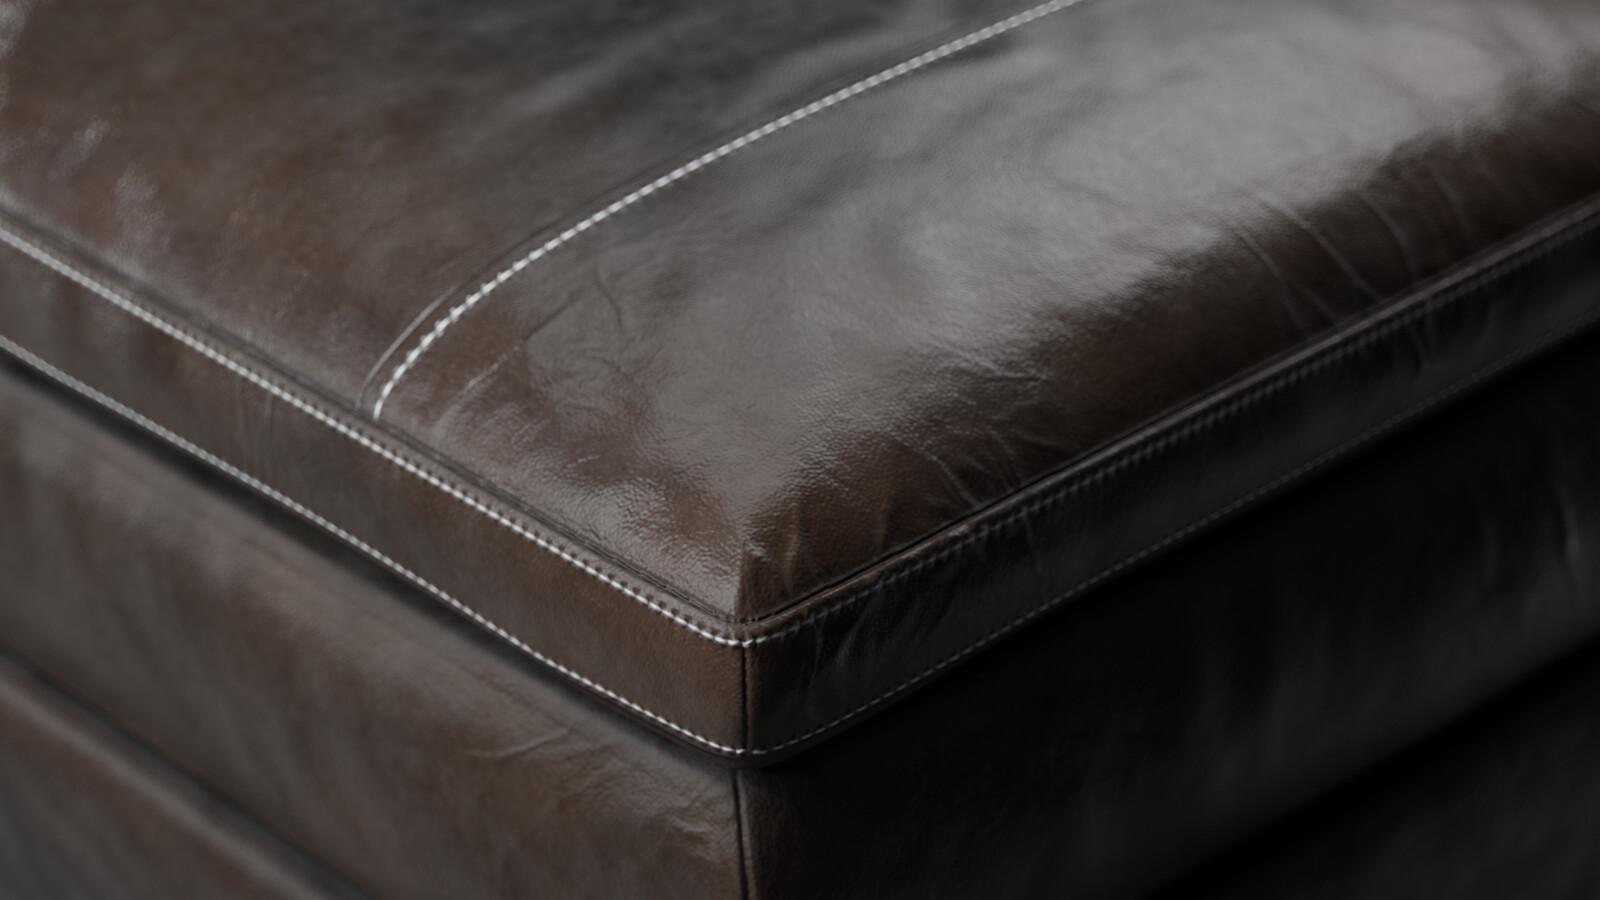 Gleason Chair Ottoman - PBR